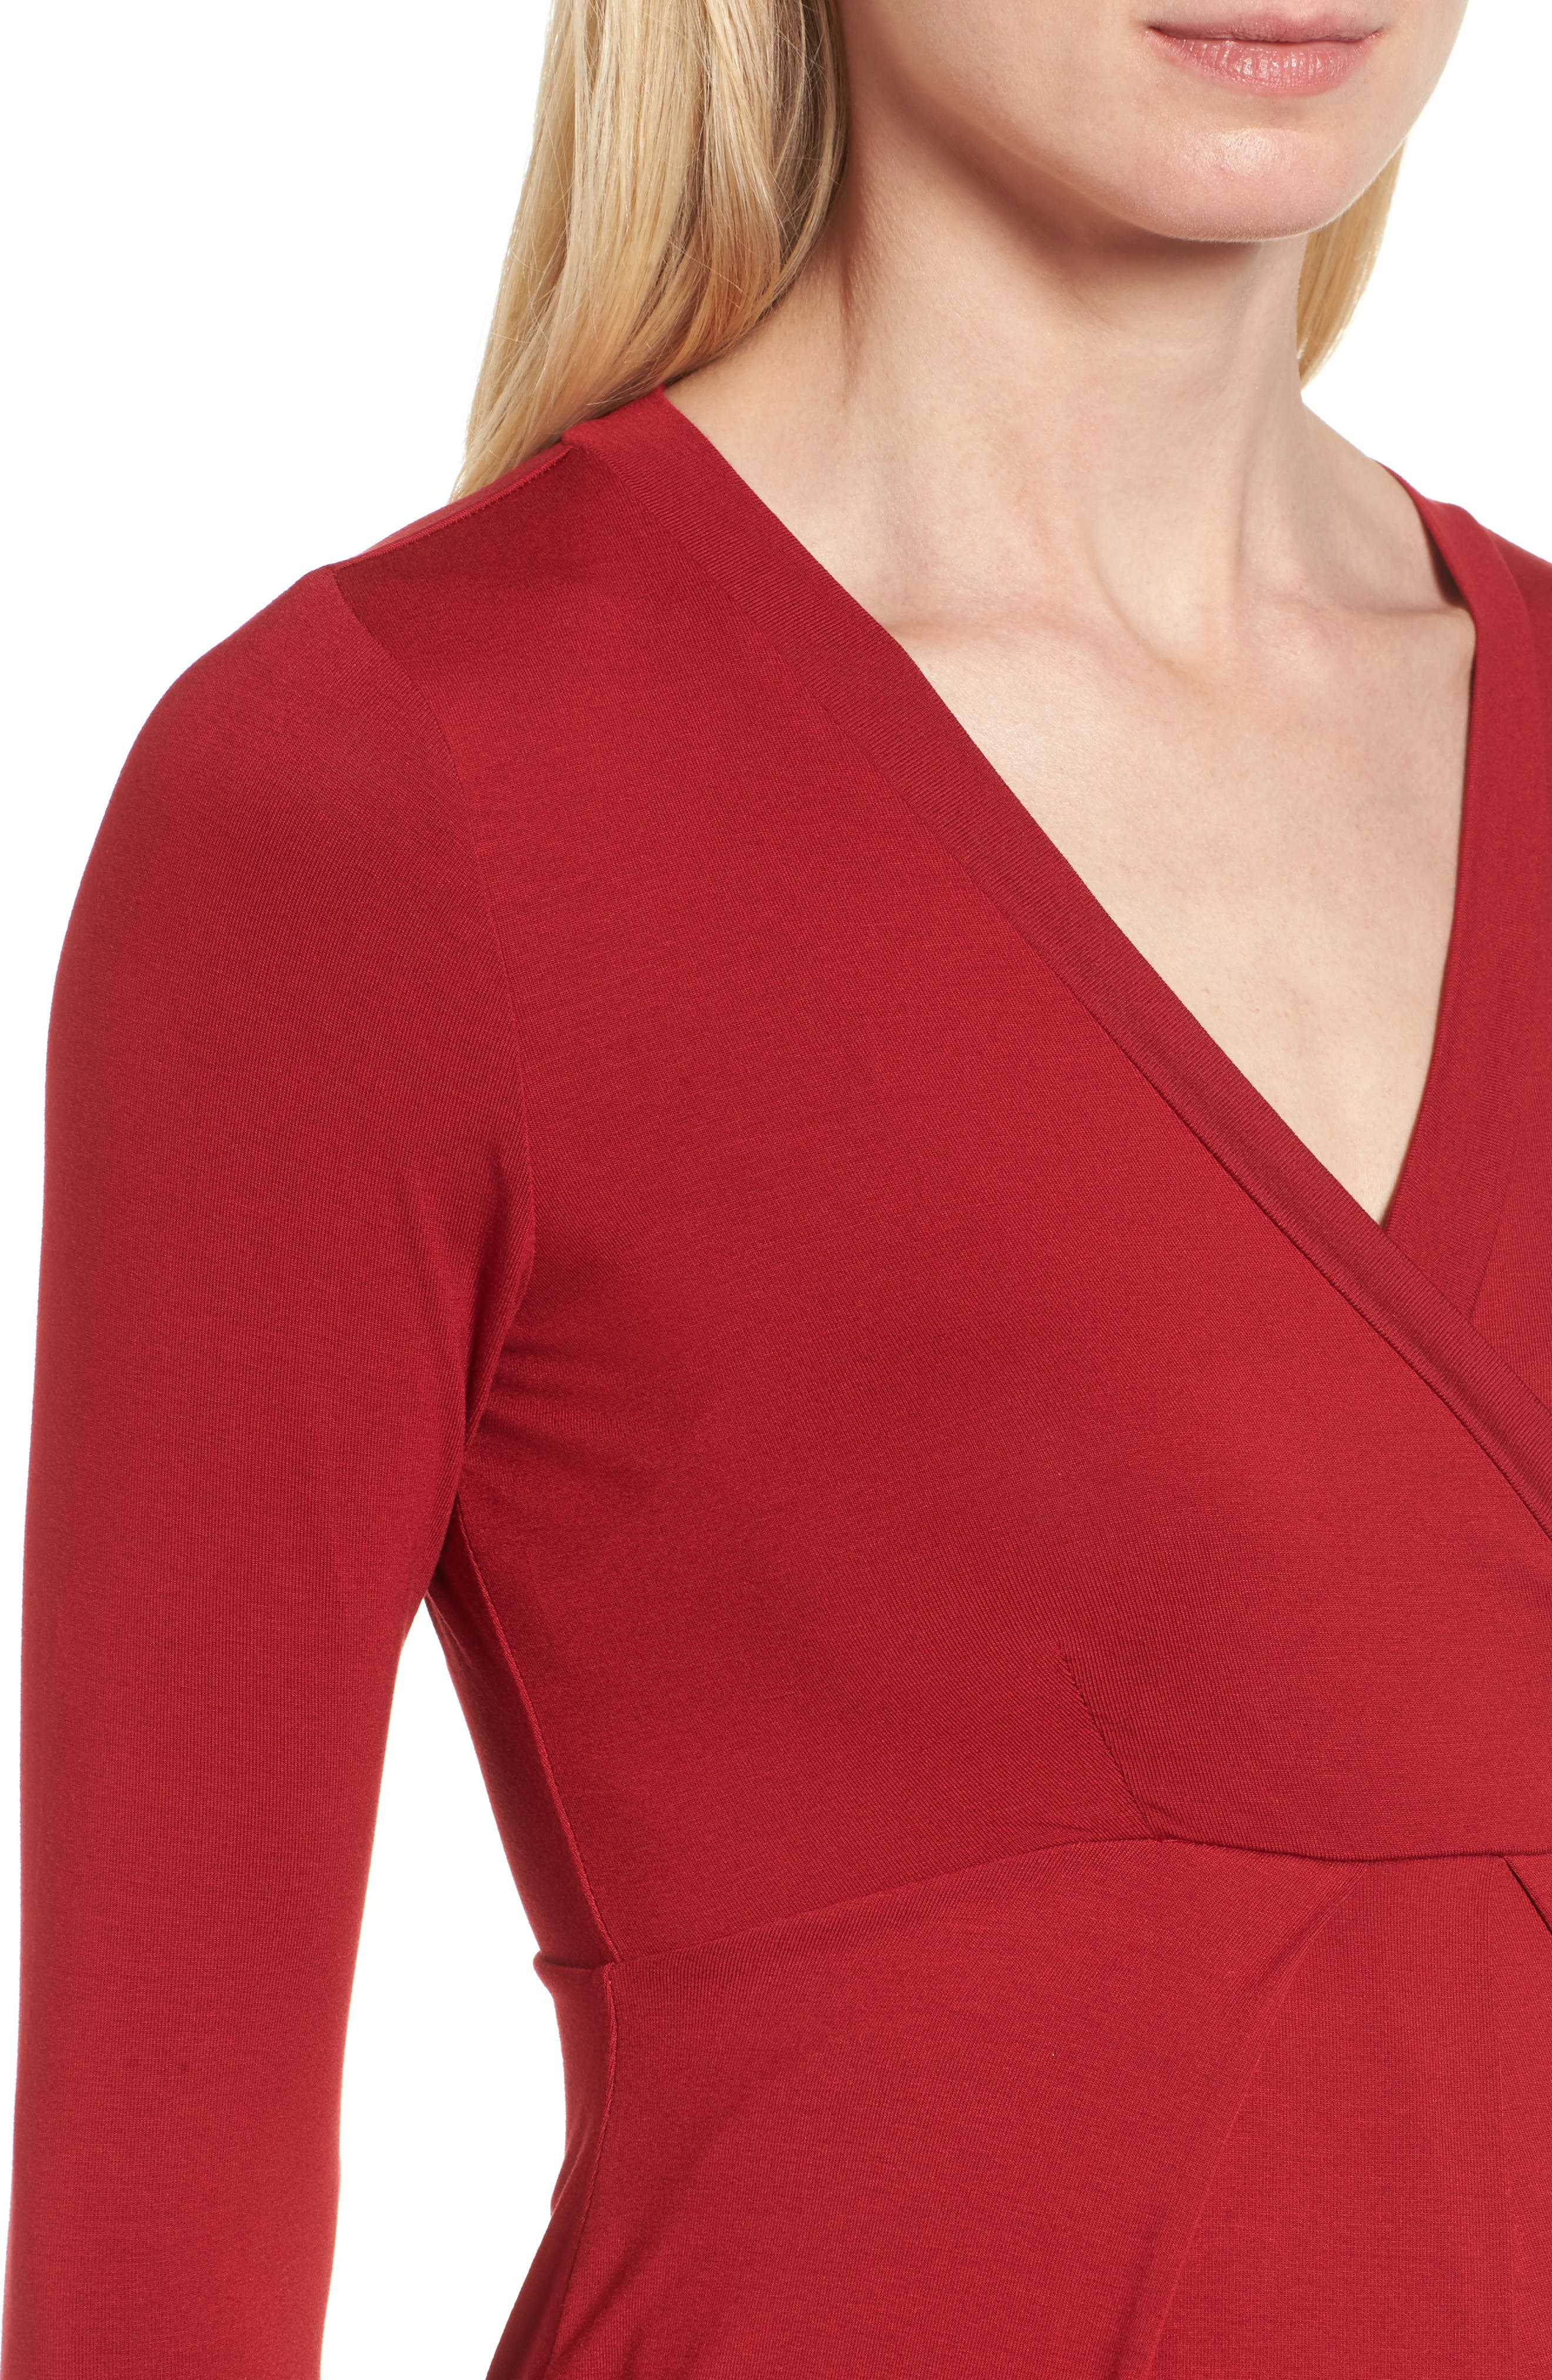 ISABELLA OLIVER,                             Gracia Surplice Maternity Dress,                             Alternate thumbnail 4, color,                             CARDAMOM RED